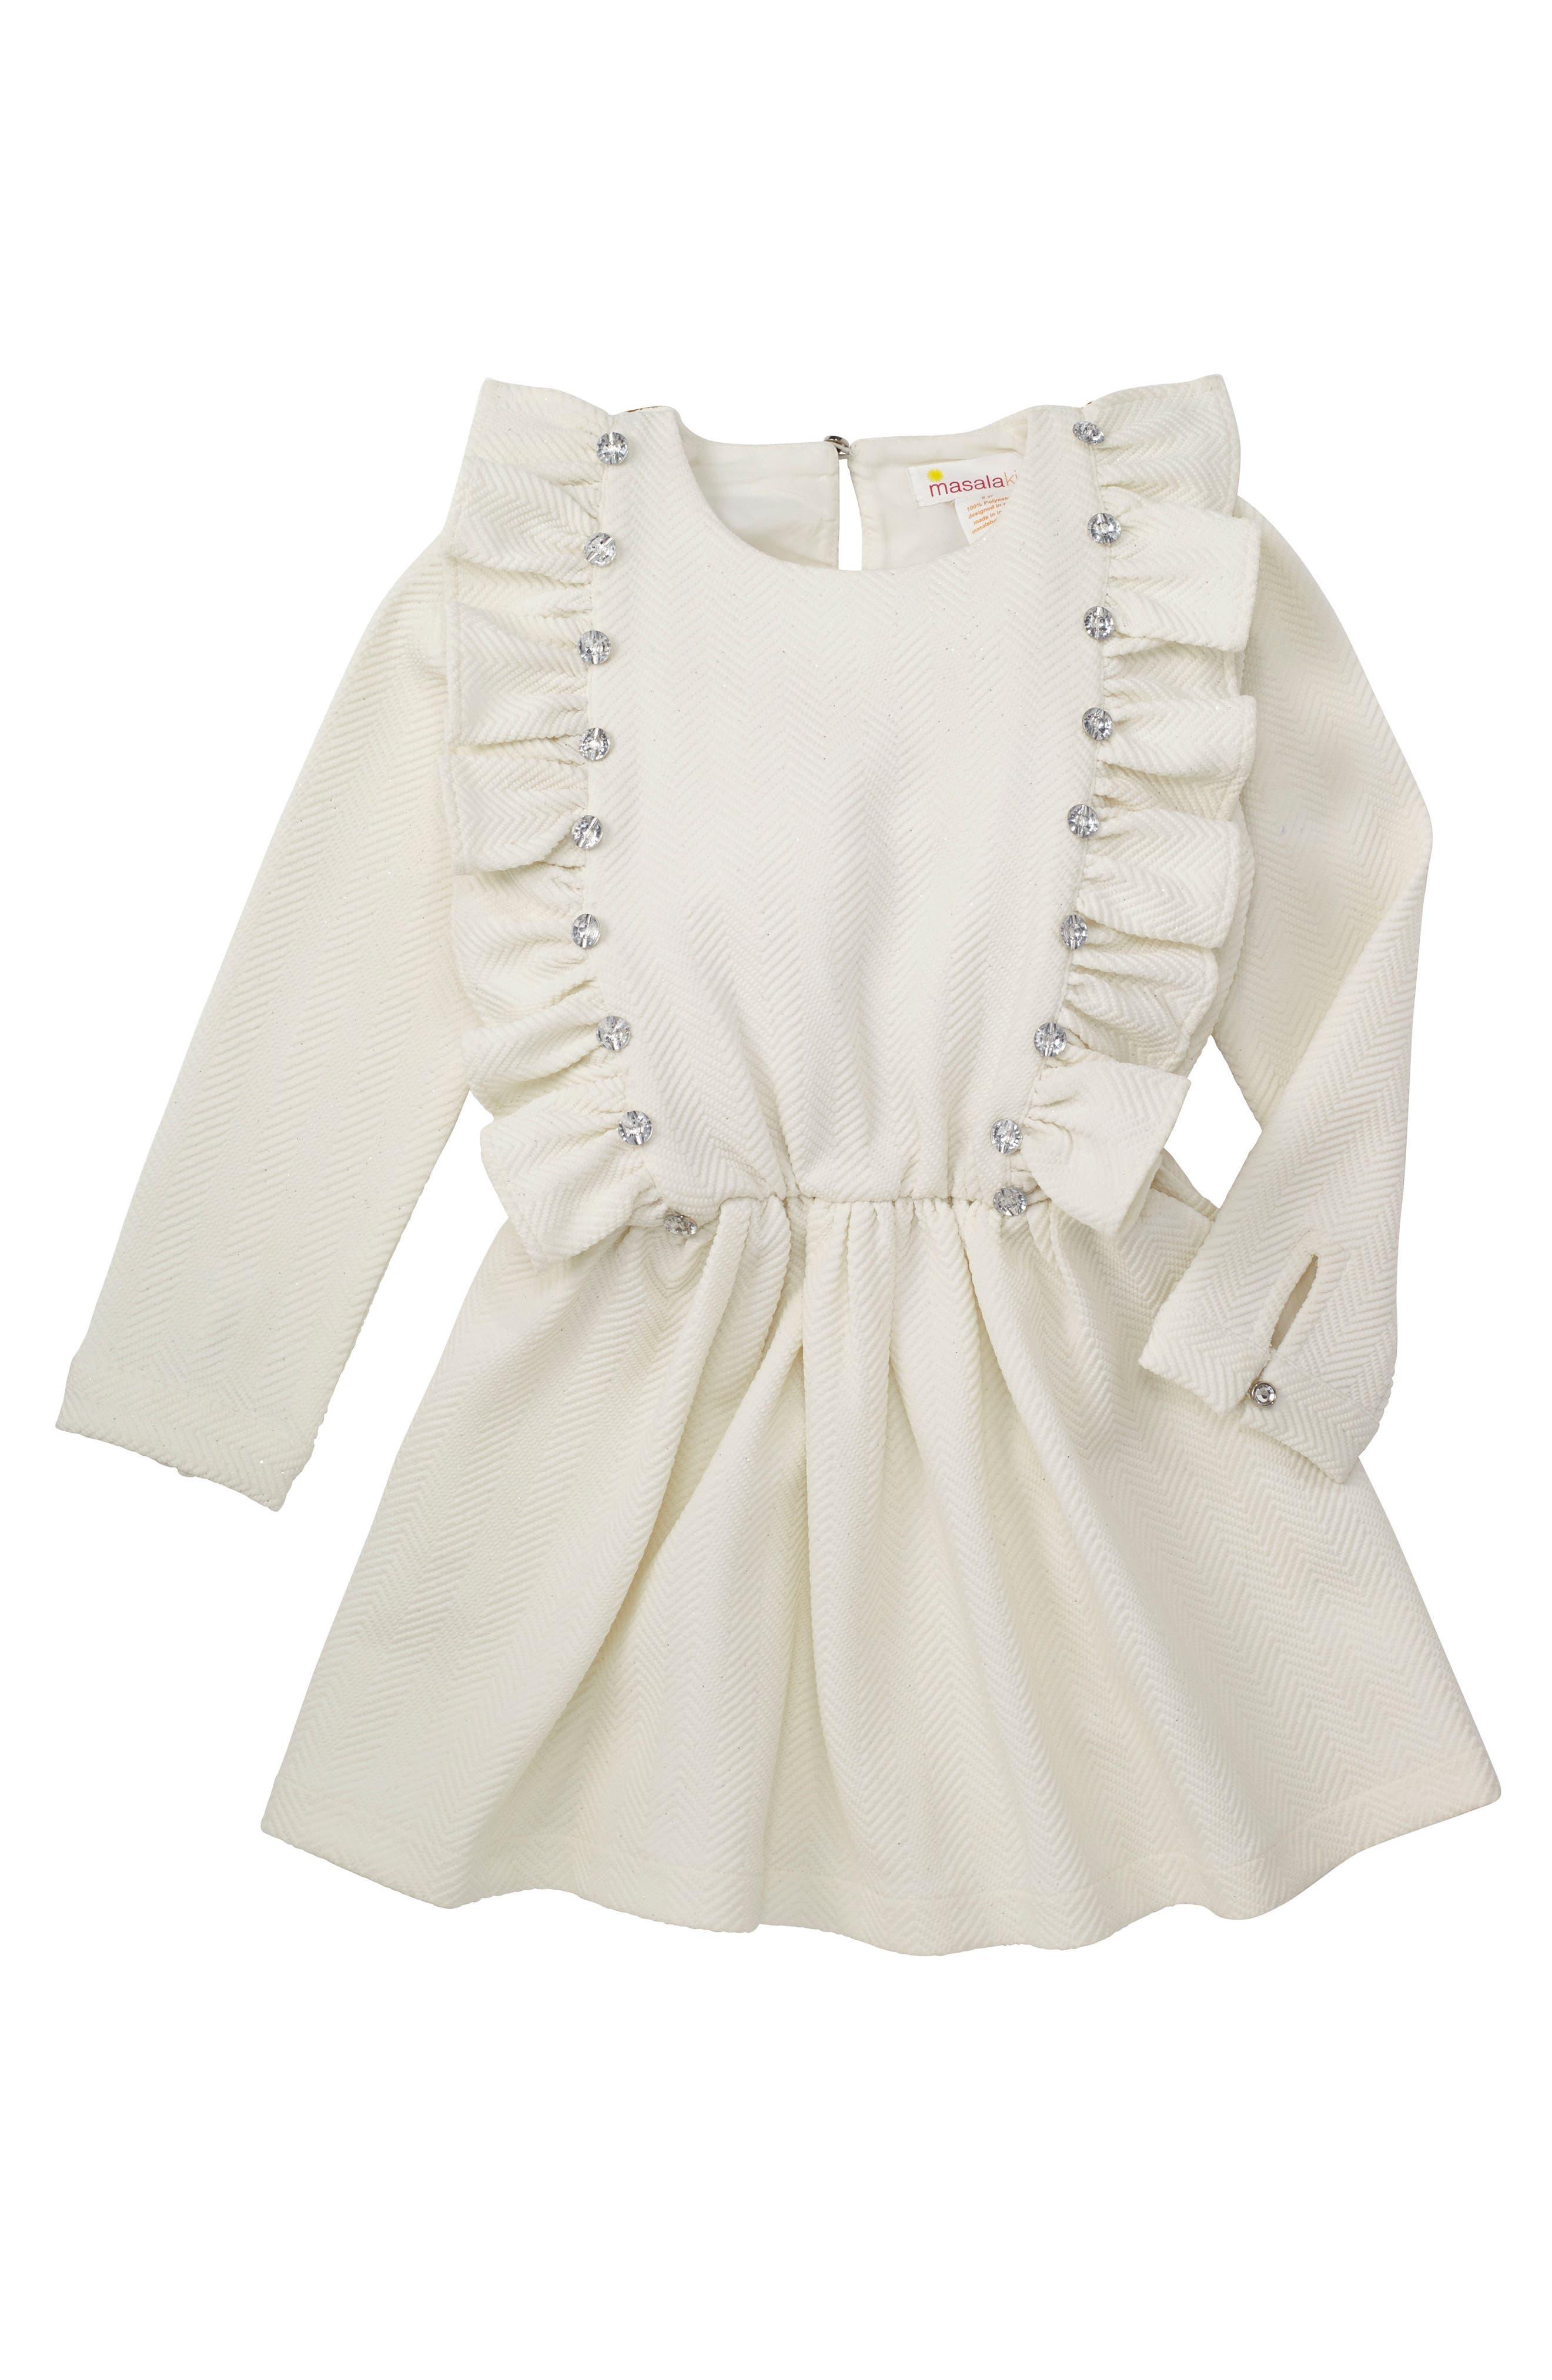 Fantasia Dress,                             Alternate thumbnail 3, color,                             901